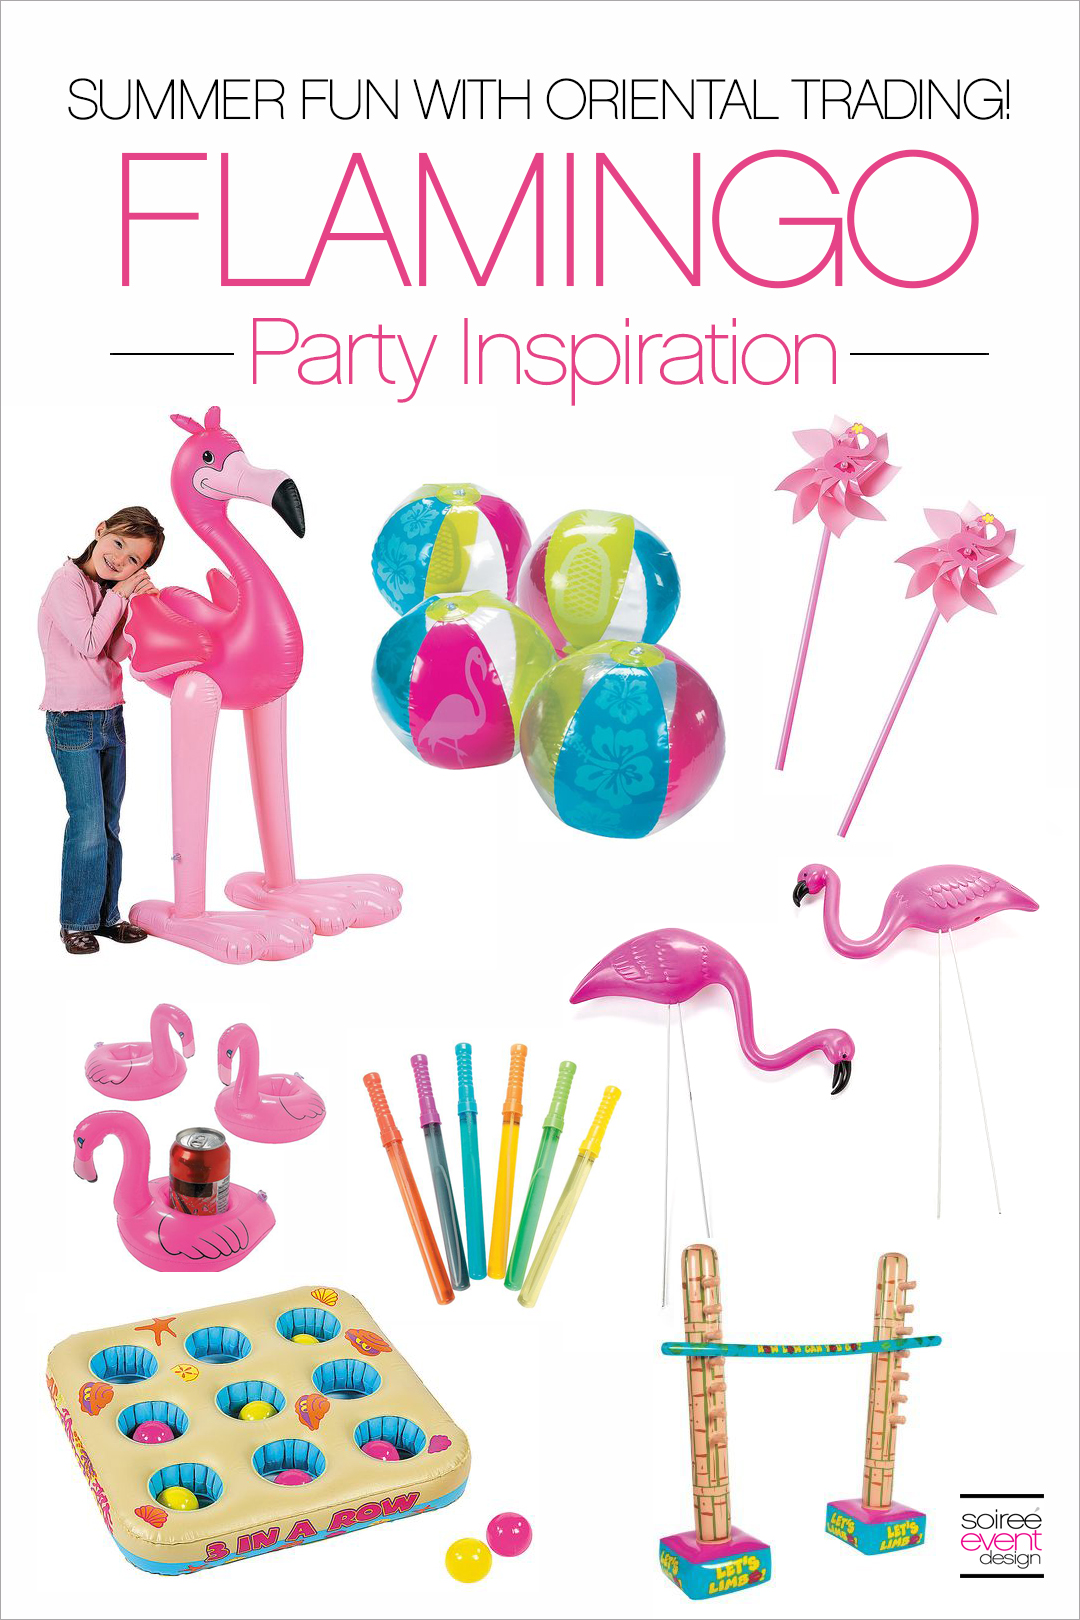 Flamingo Party Inspiration